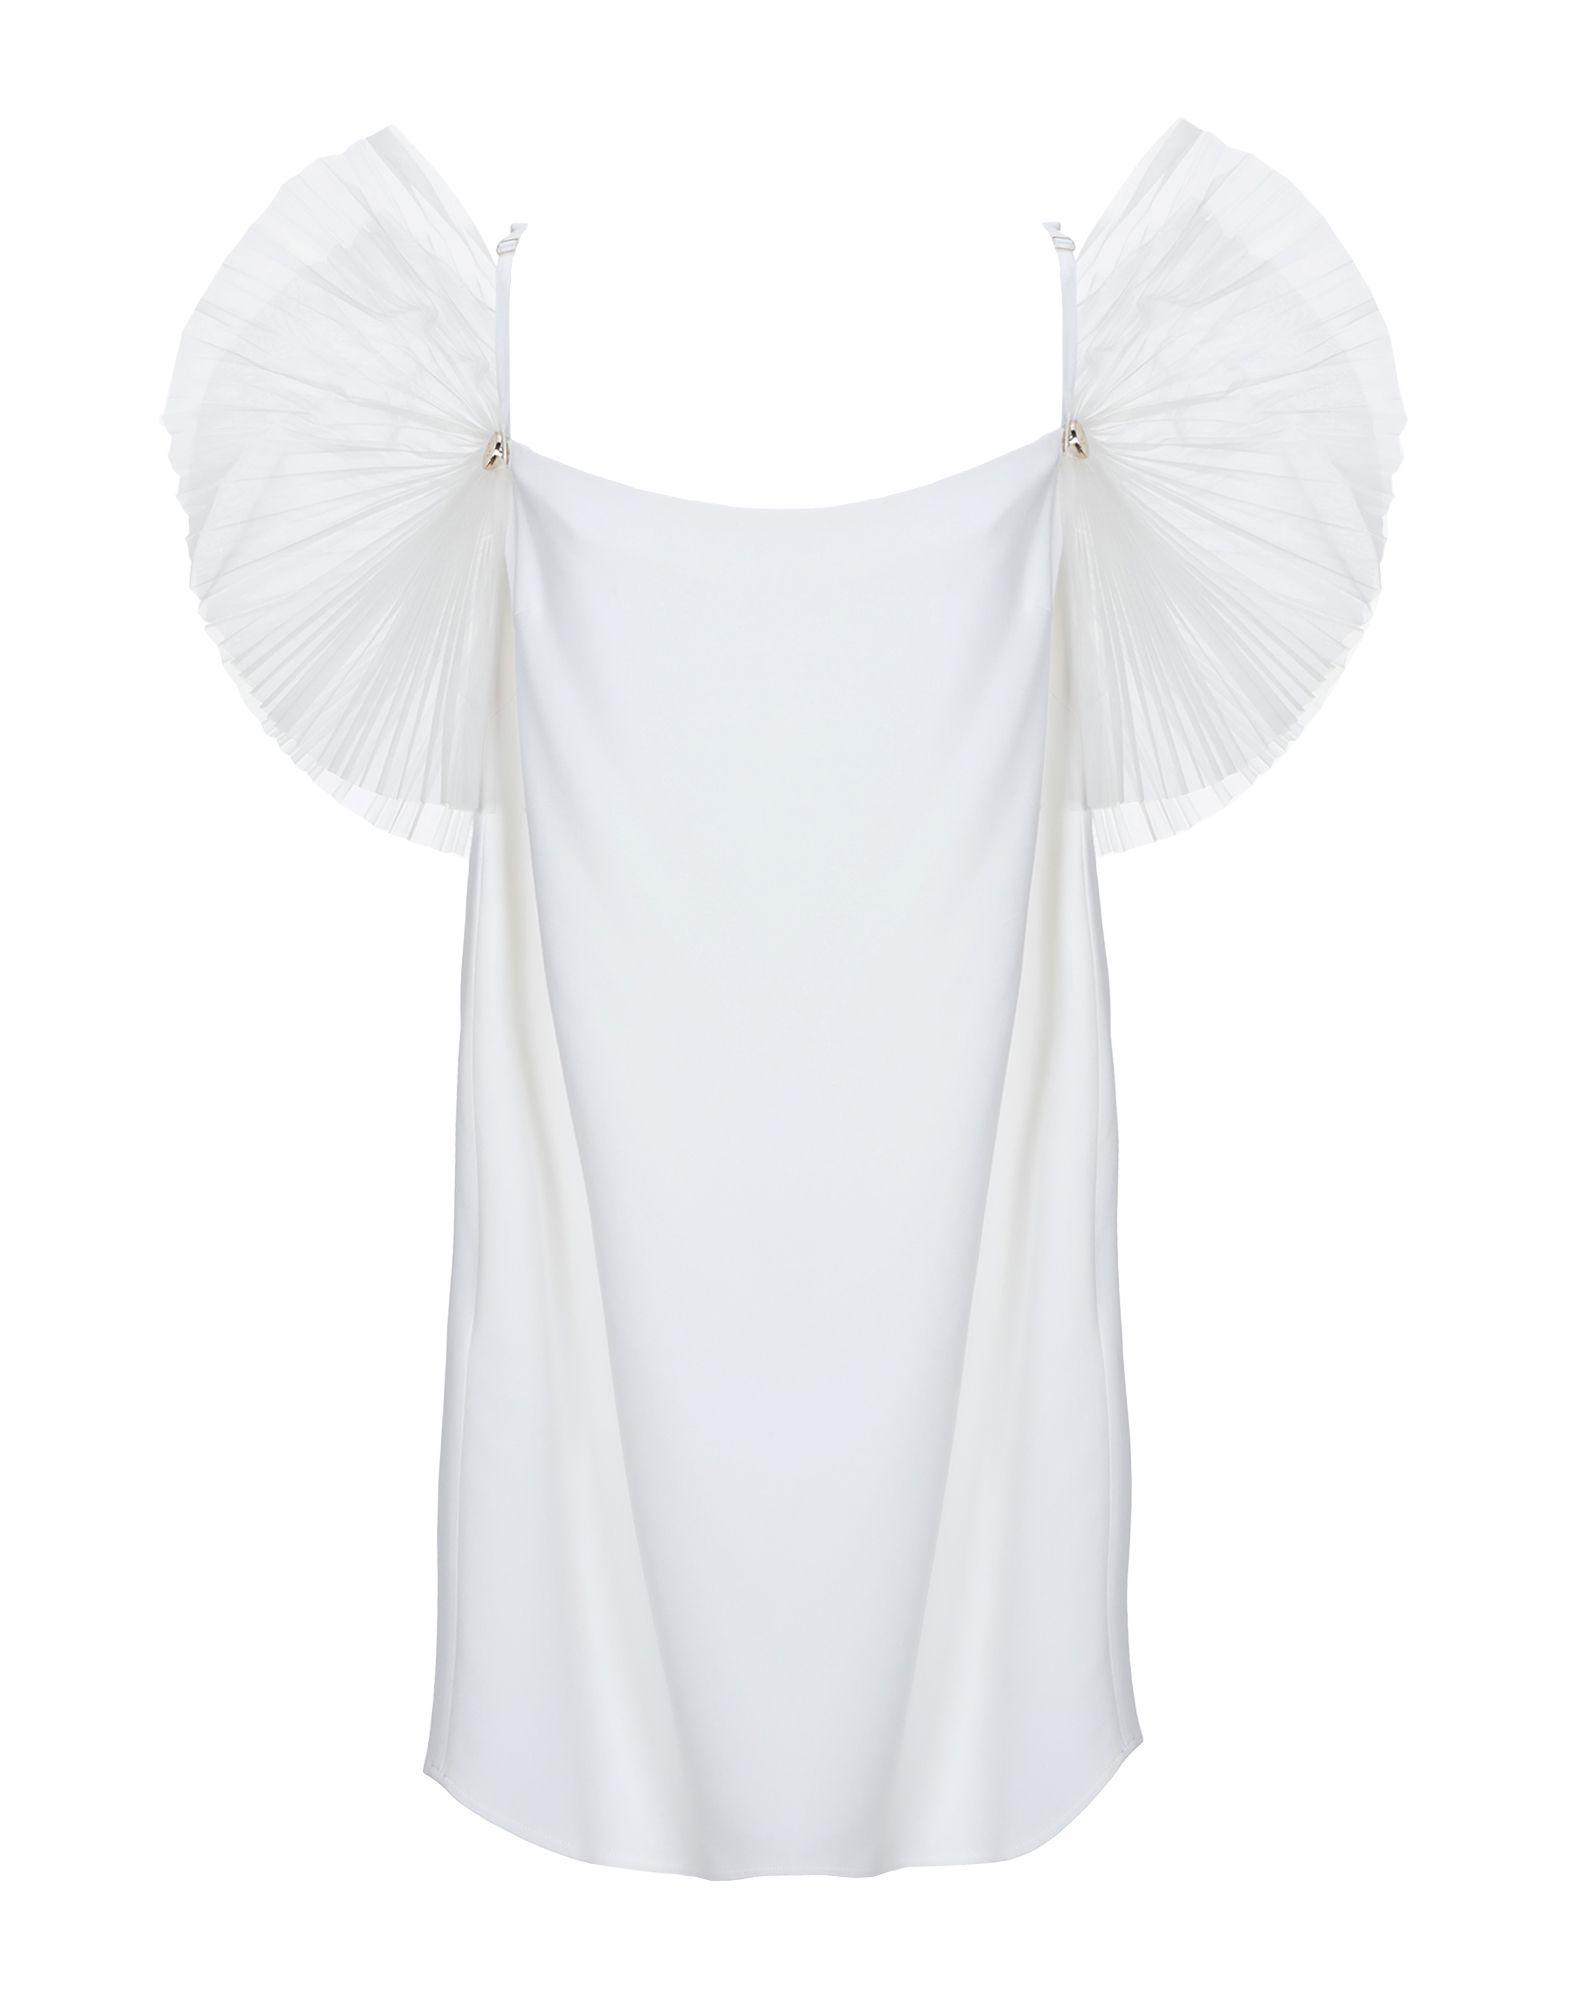 PASSEPARTOUT DRESS by ELISABETTA FRANCHI CELYN b. Короткое платье платье quelle b c best connections by heine 61054